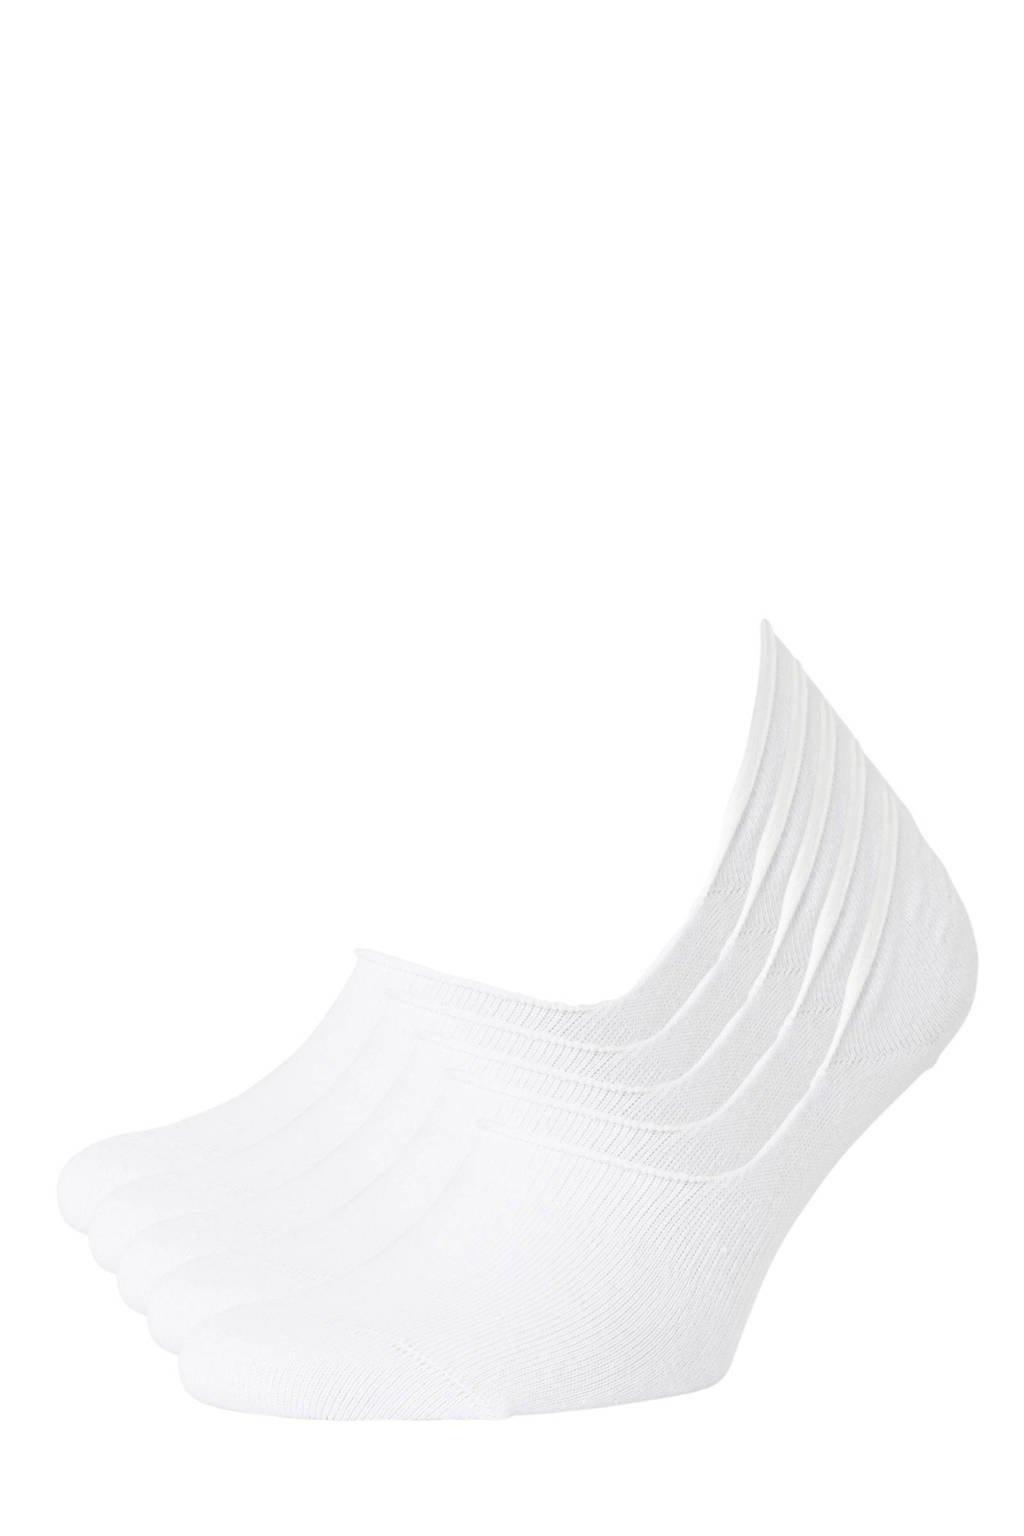 whkmp's own no-show sneakersokken - set van 5 wit, White